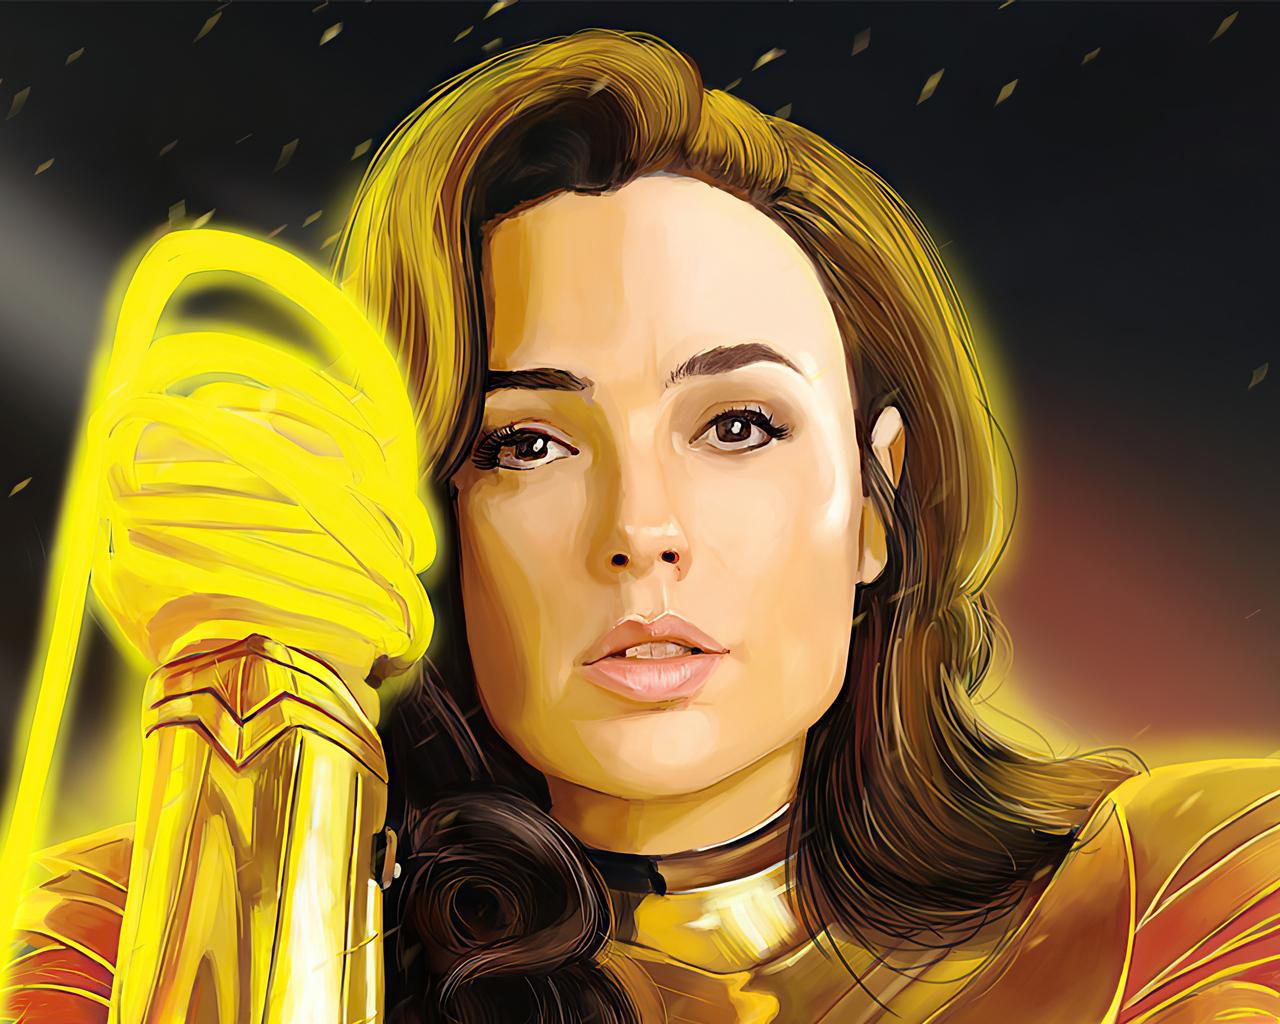 wonder-woman-1984-yellow-suit-5x.jpg